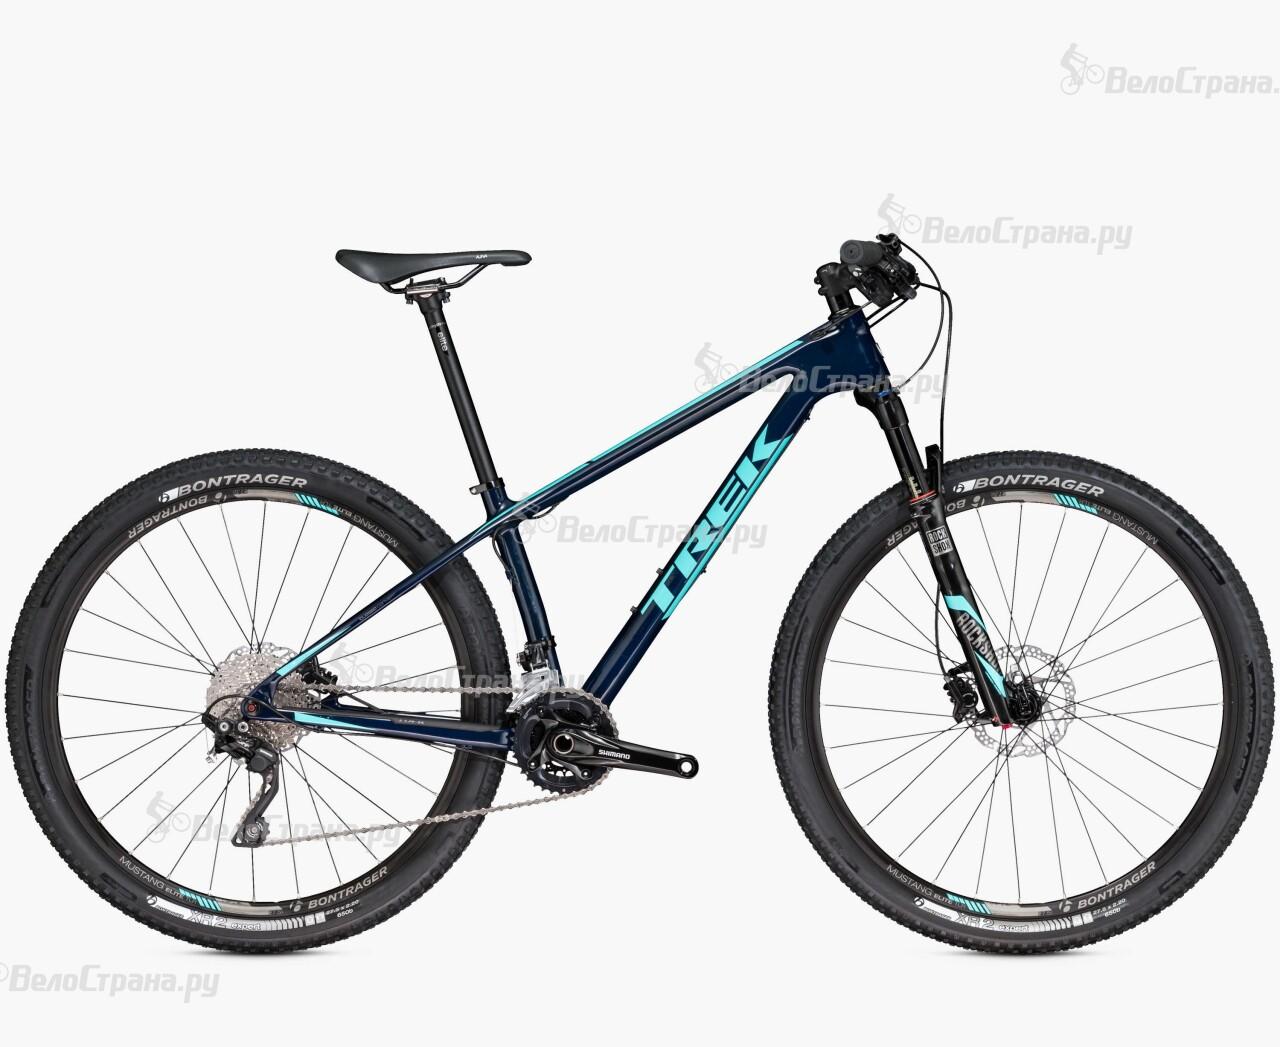 Велосипед Trek Superfly 9.6 Women's 29 (2016) цены онлайн